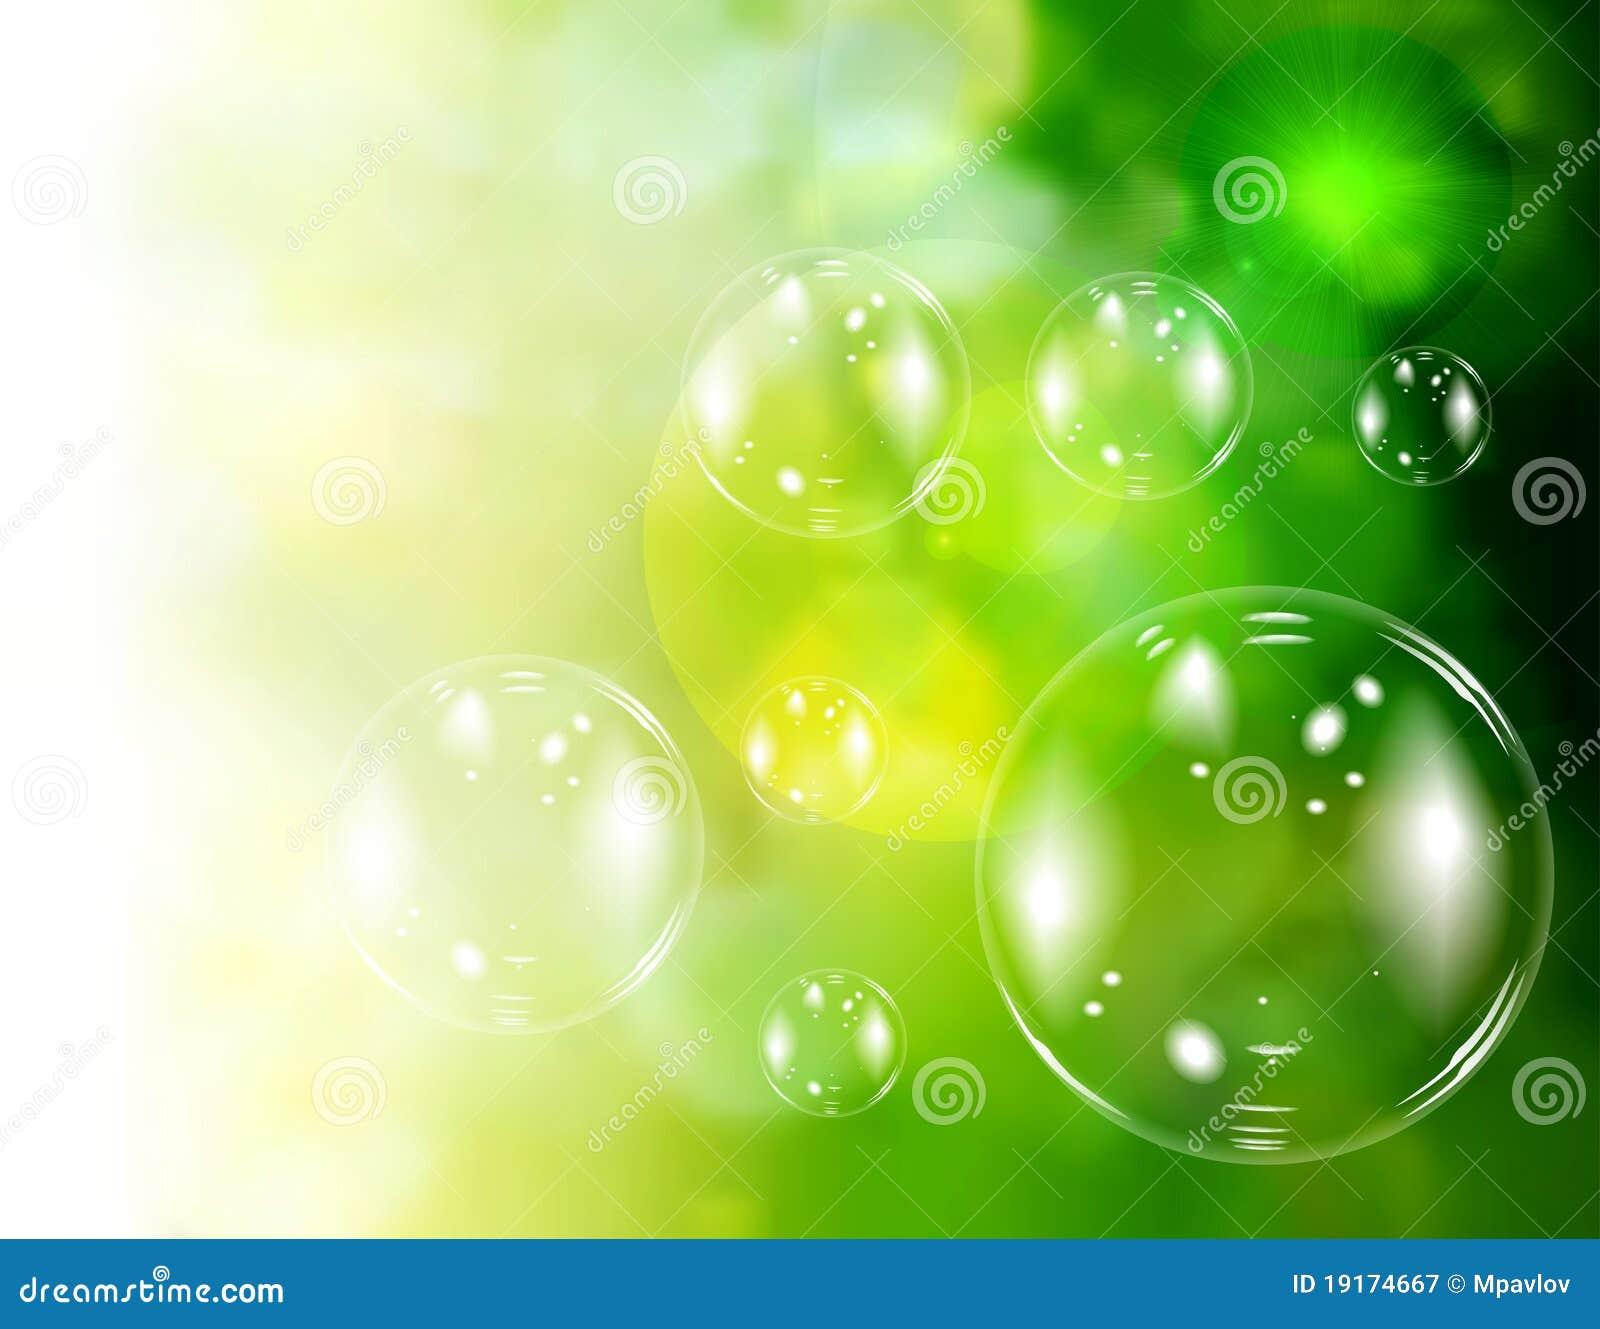 Seifenluftblasen